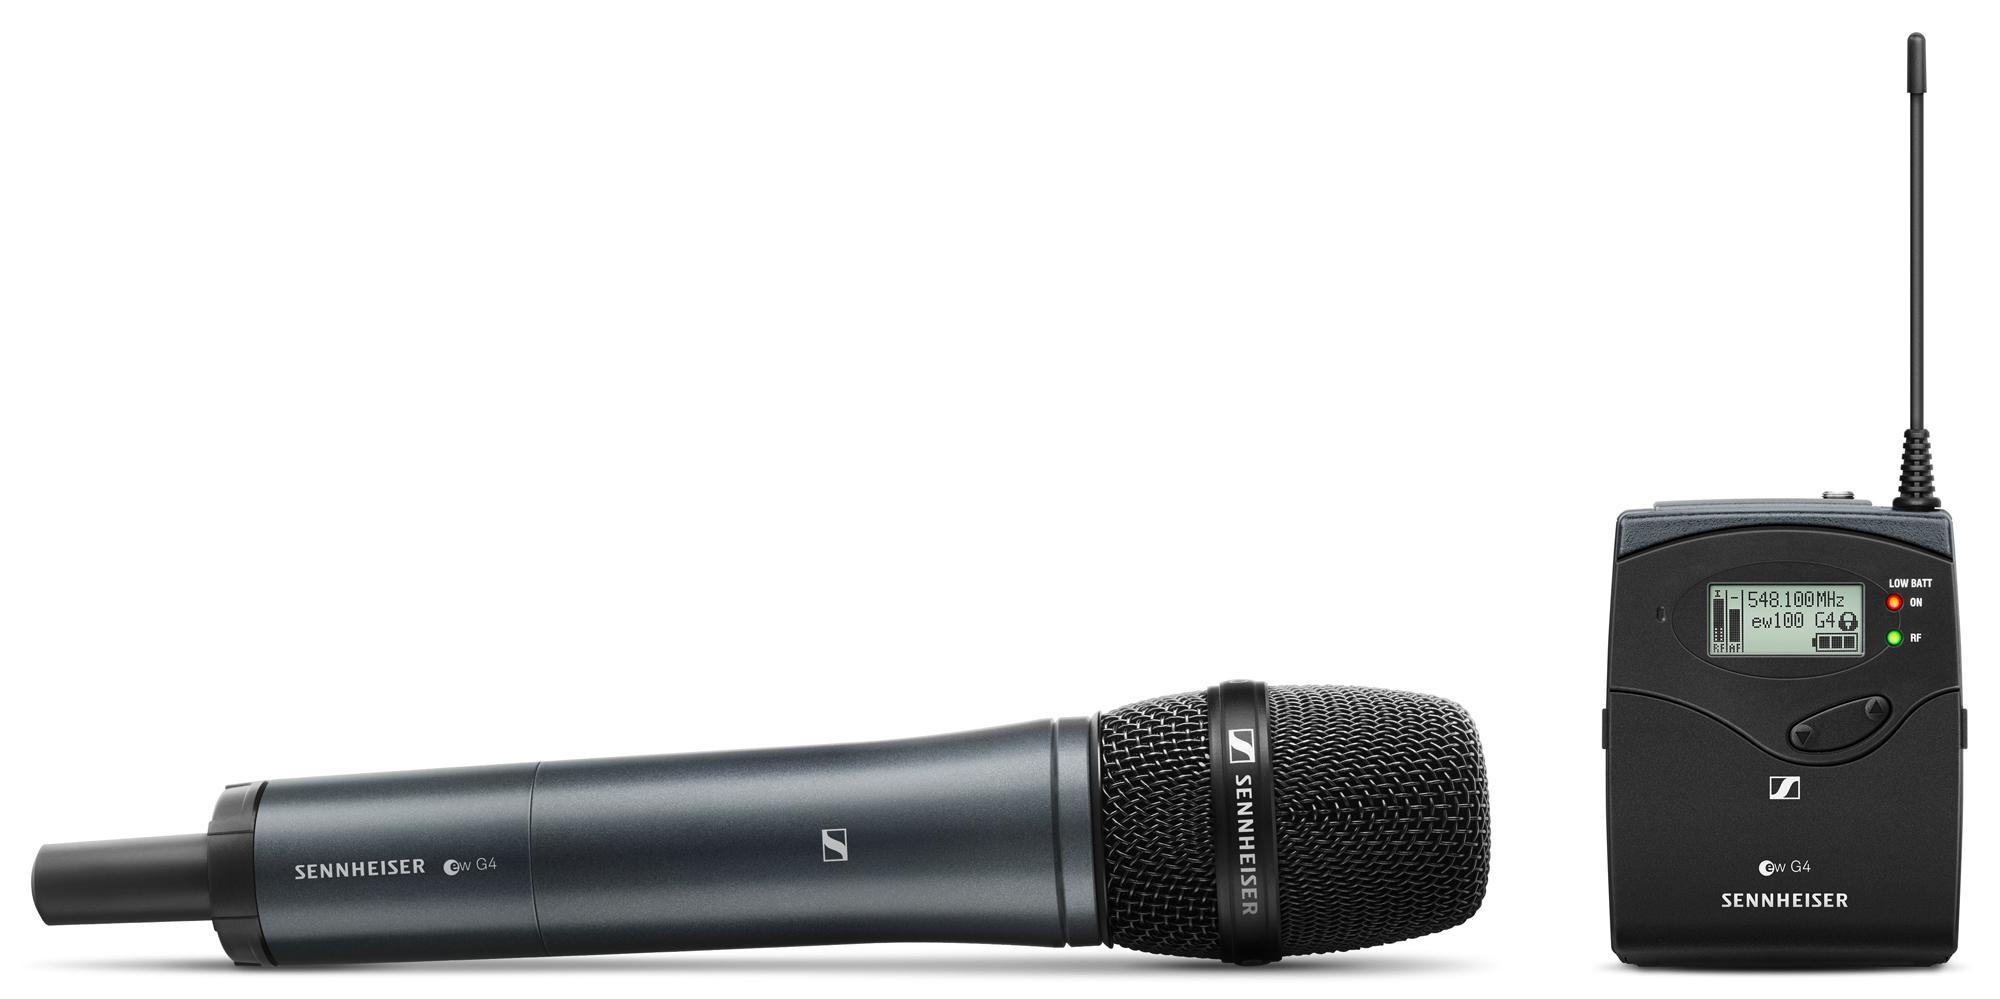 Drahtlossysteme - Sennheiser EW 135P G4 Handheld Camera Set E Band - Onlineshop Musikhaus Kirstein